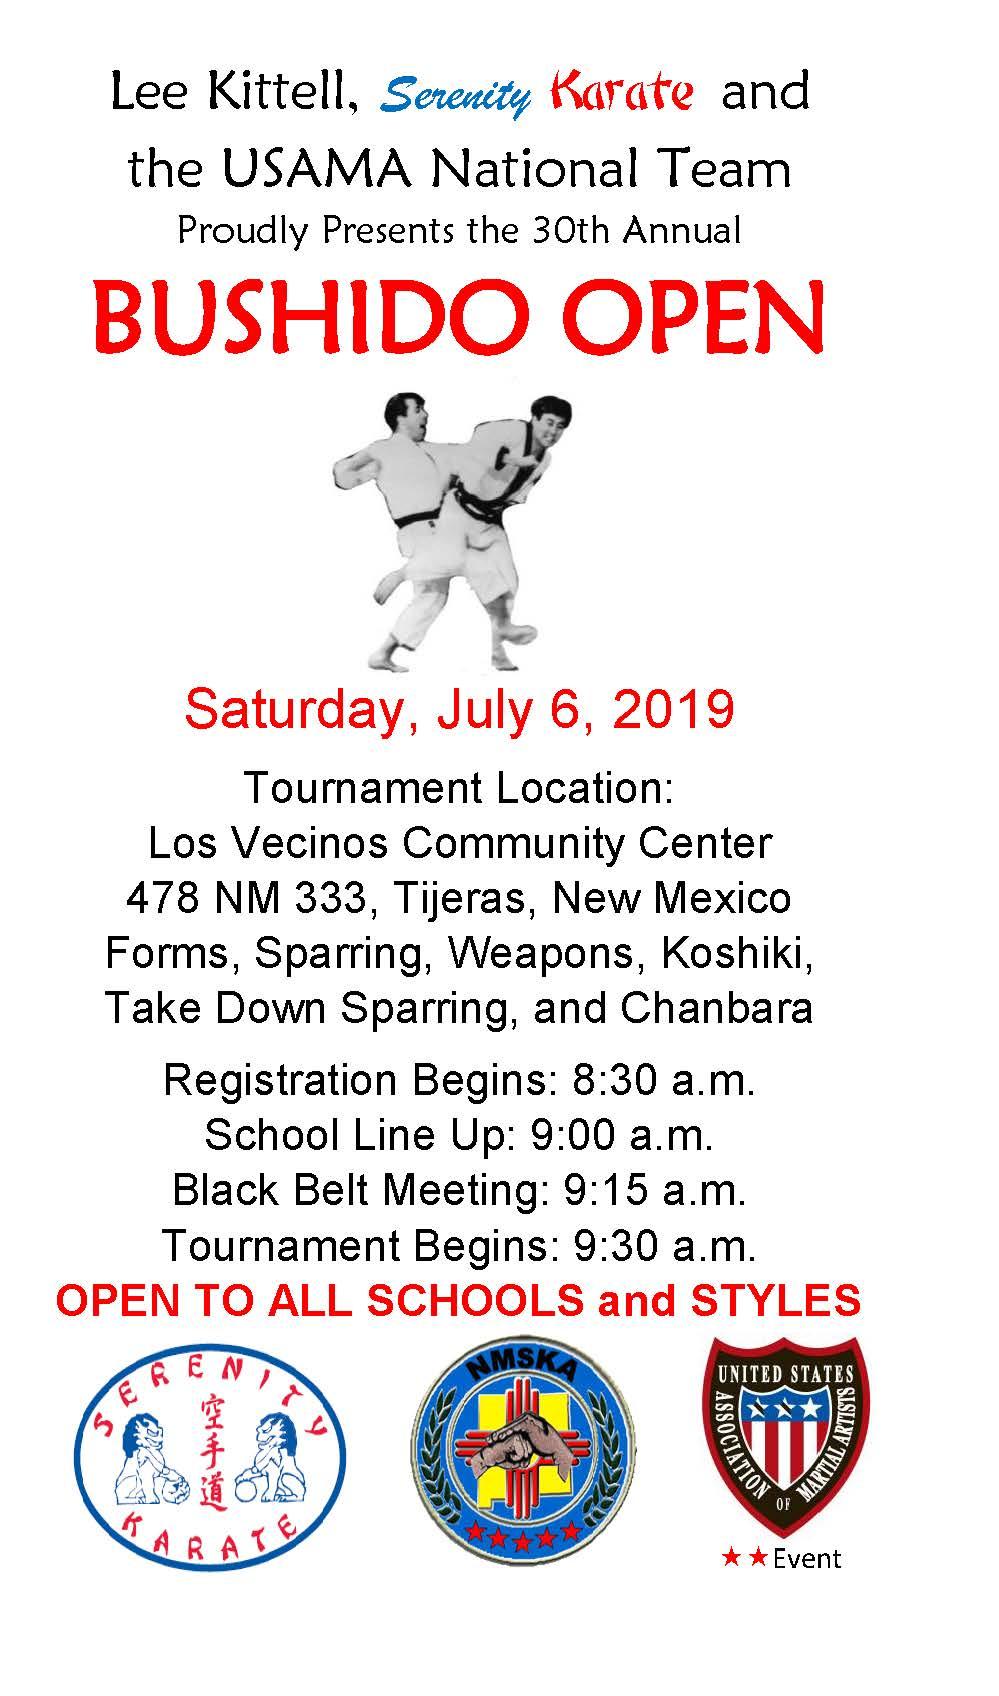 Event Listing - US Association of Martial Artists